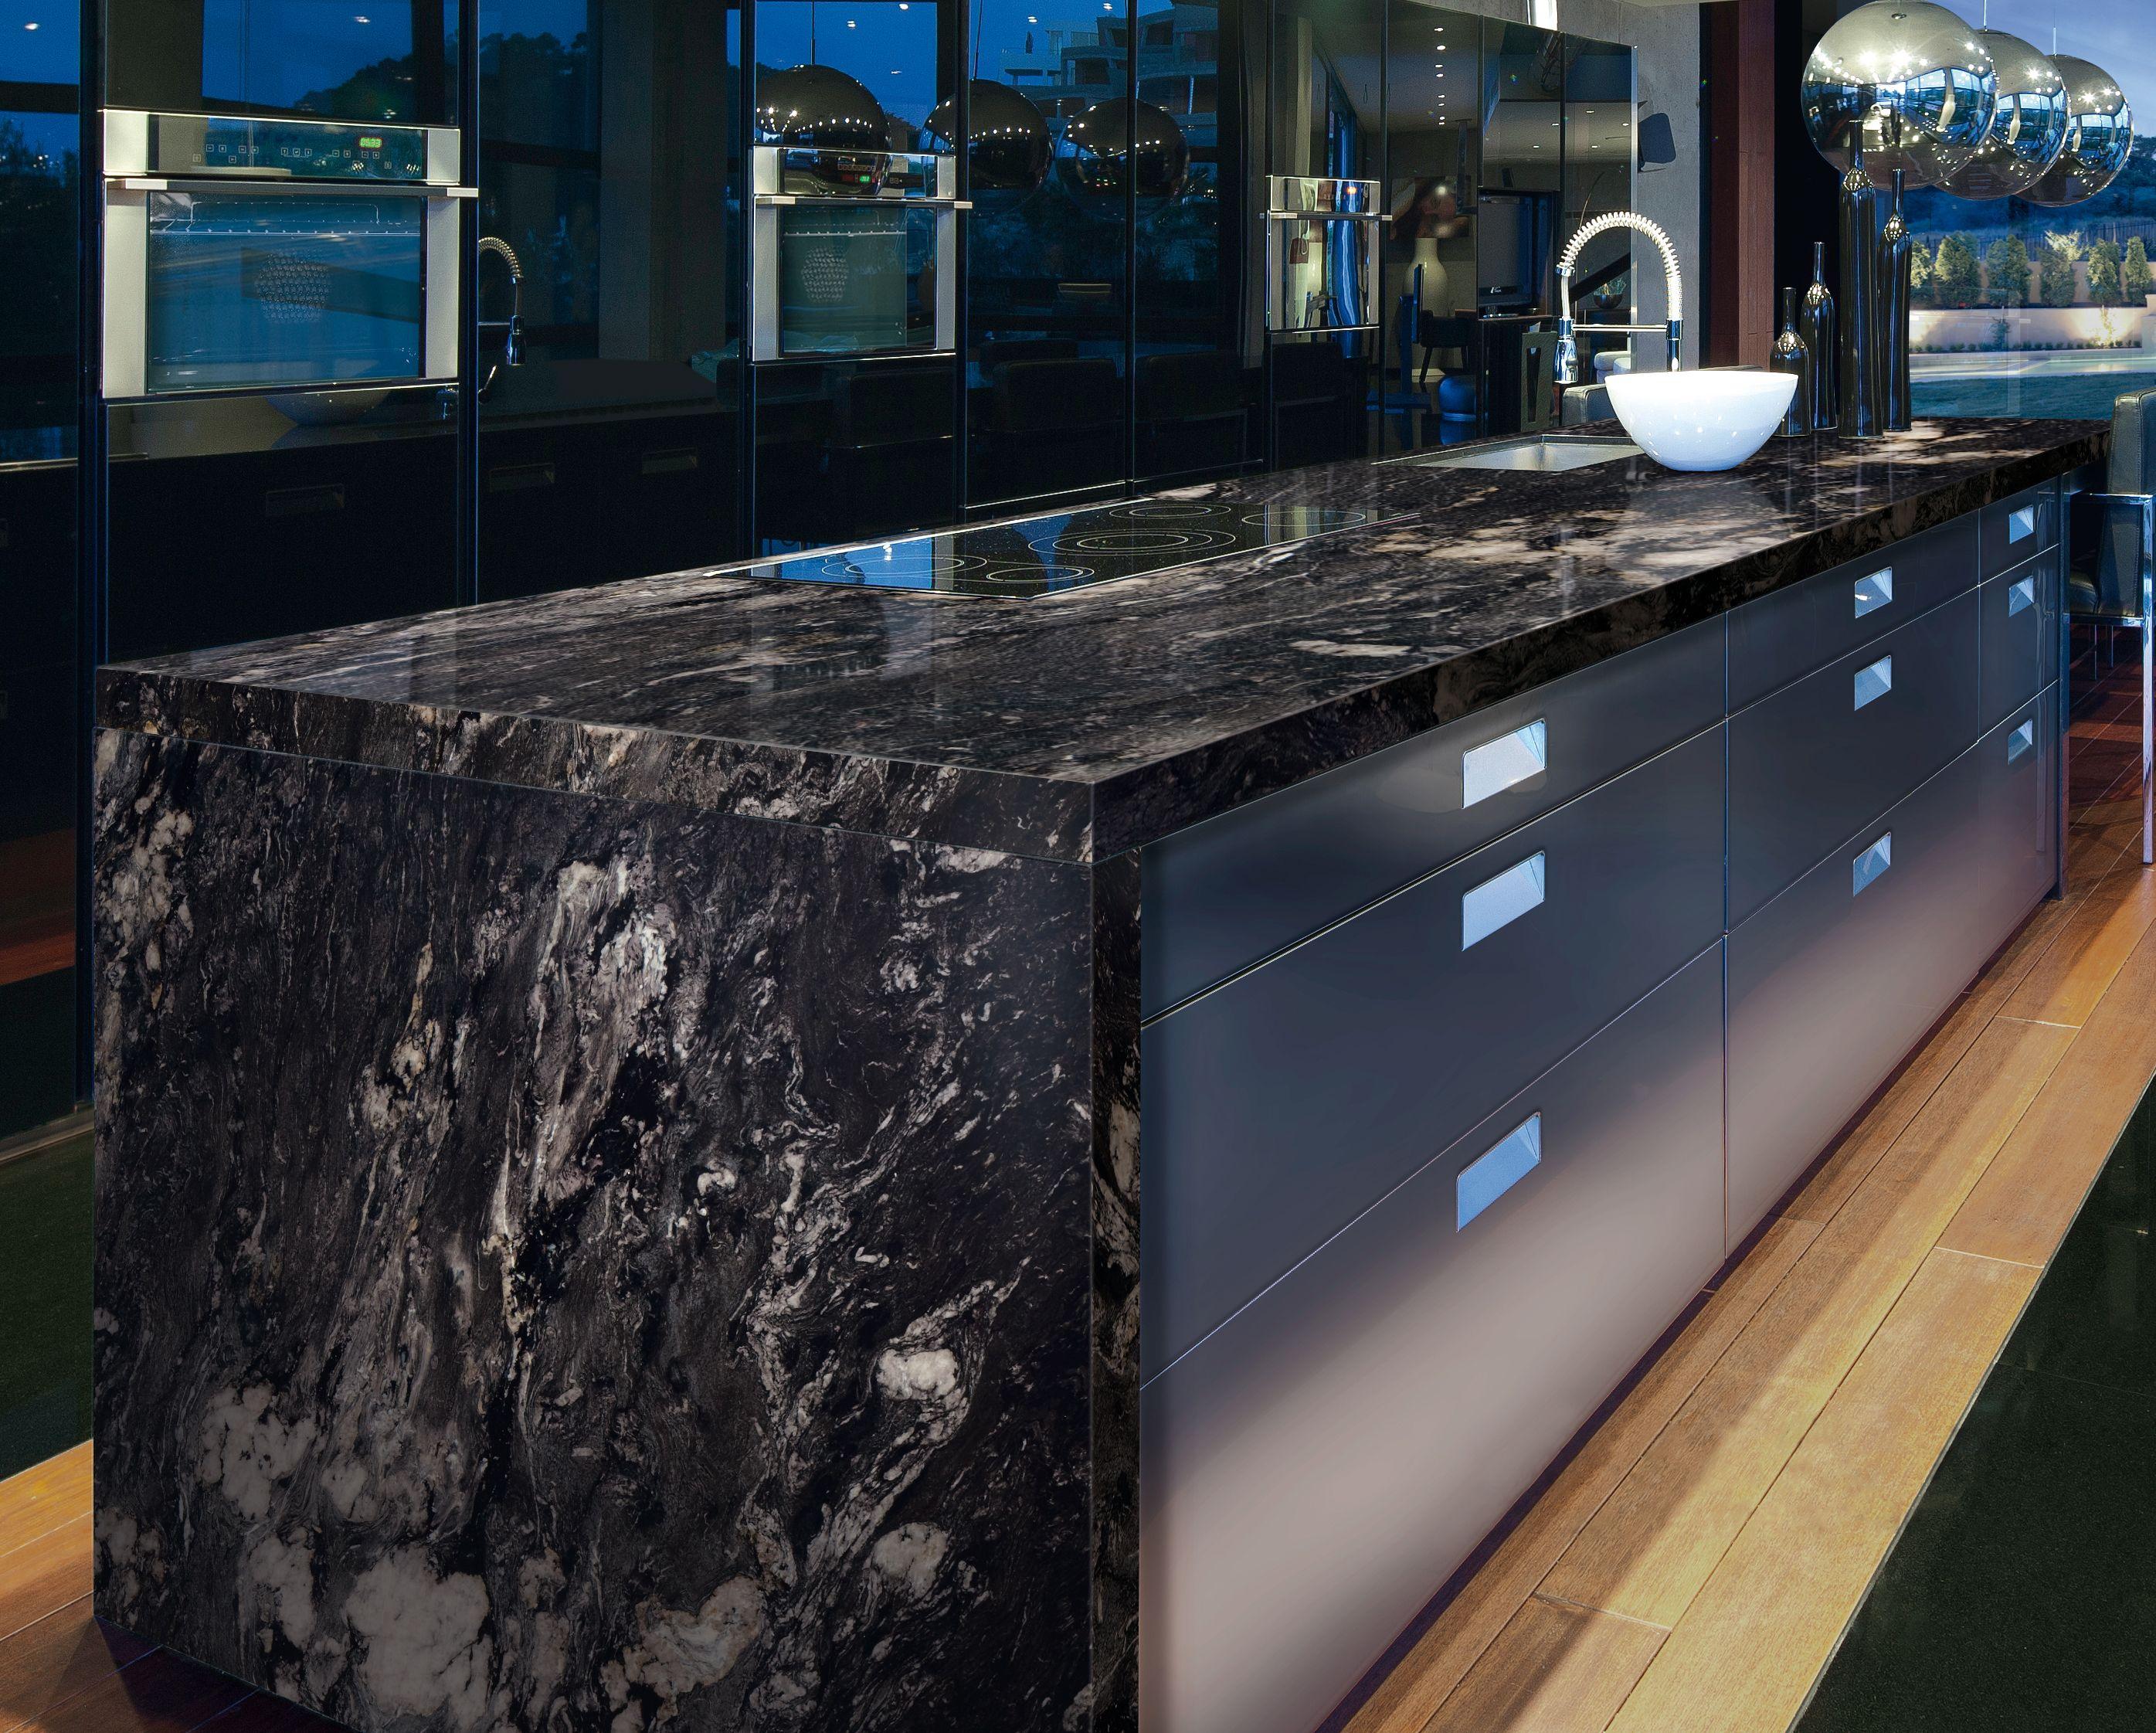 Titanium Granite Kitchen Counter | http://www.marmol.com/product ...